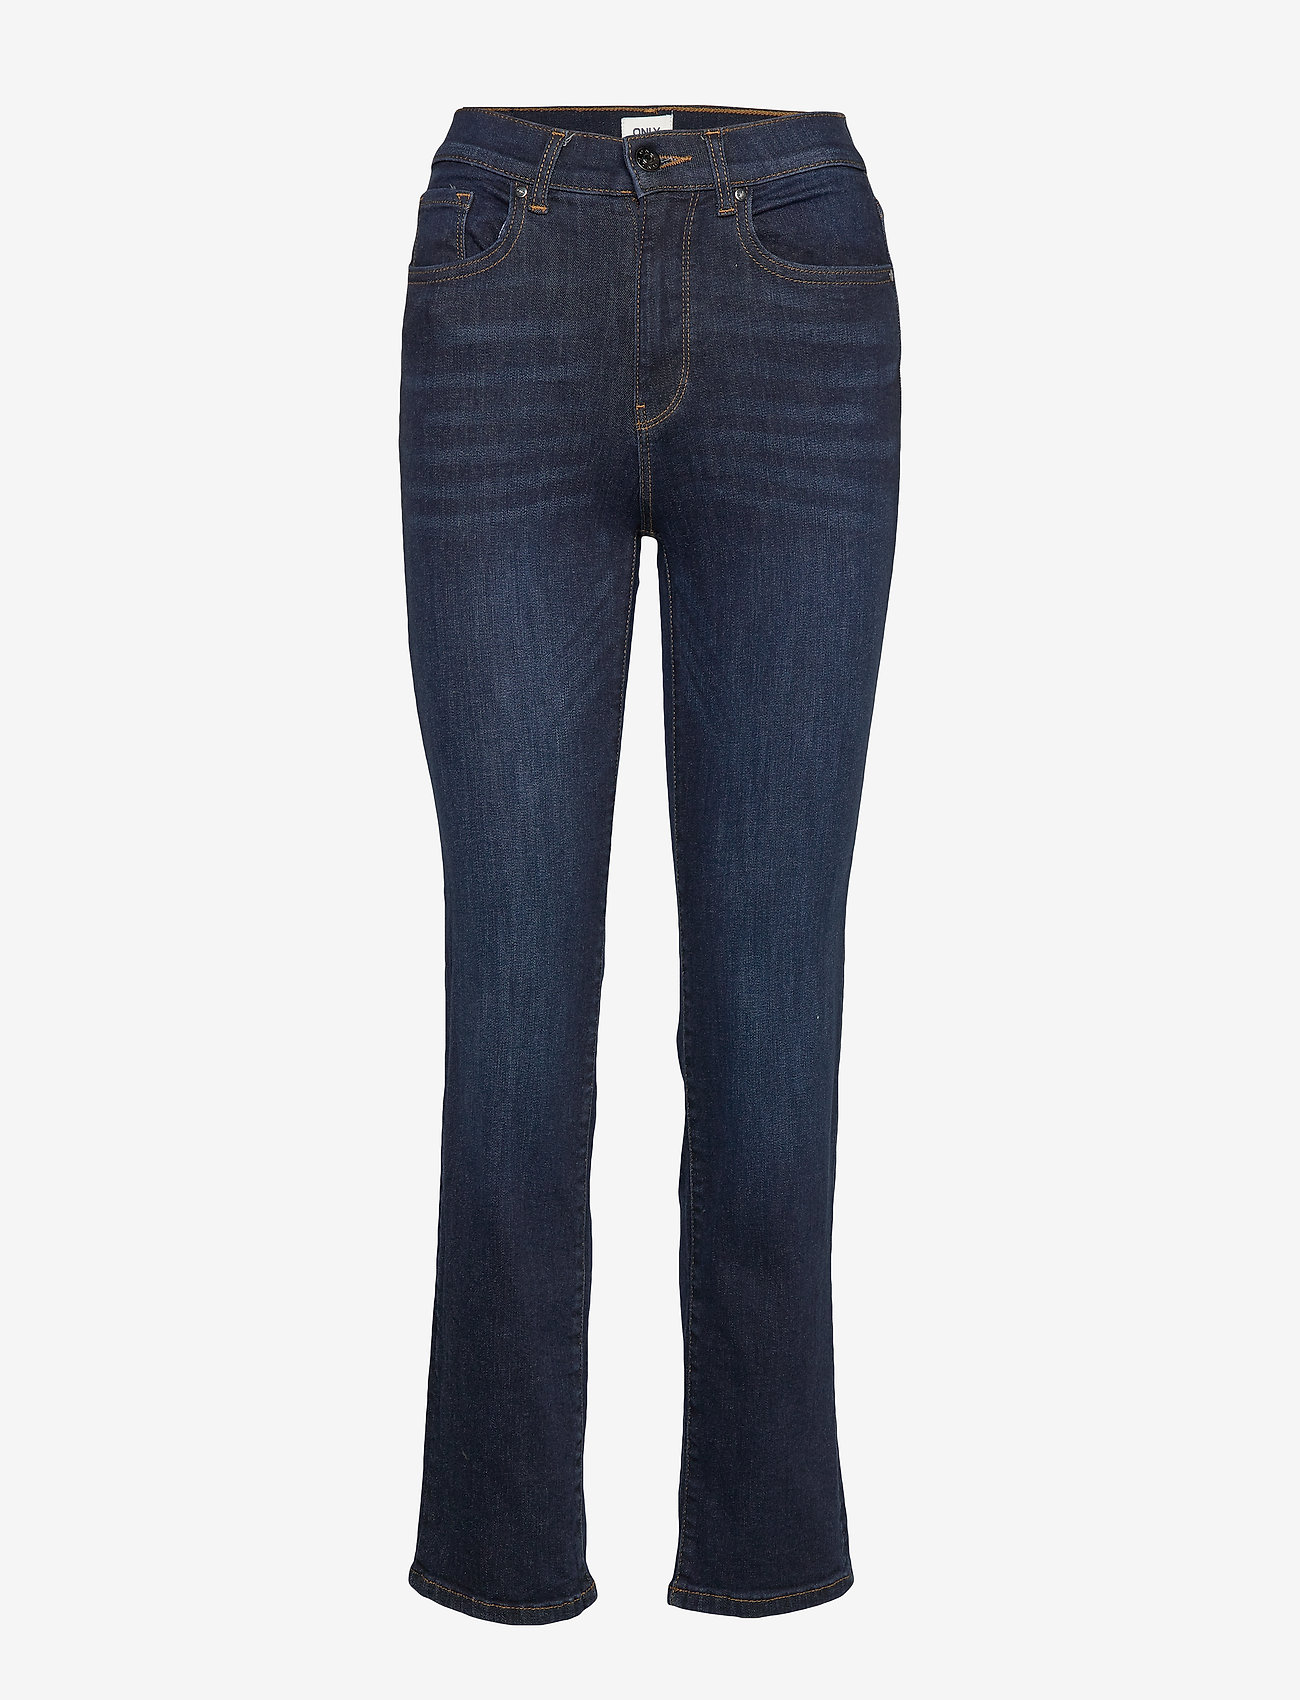 ONLY - ONLNAHLA LIFE HW STRT BB SOO2524 - straight jeans - dark blue denim - 0